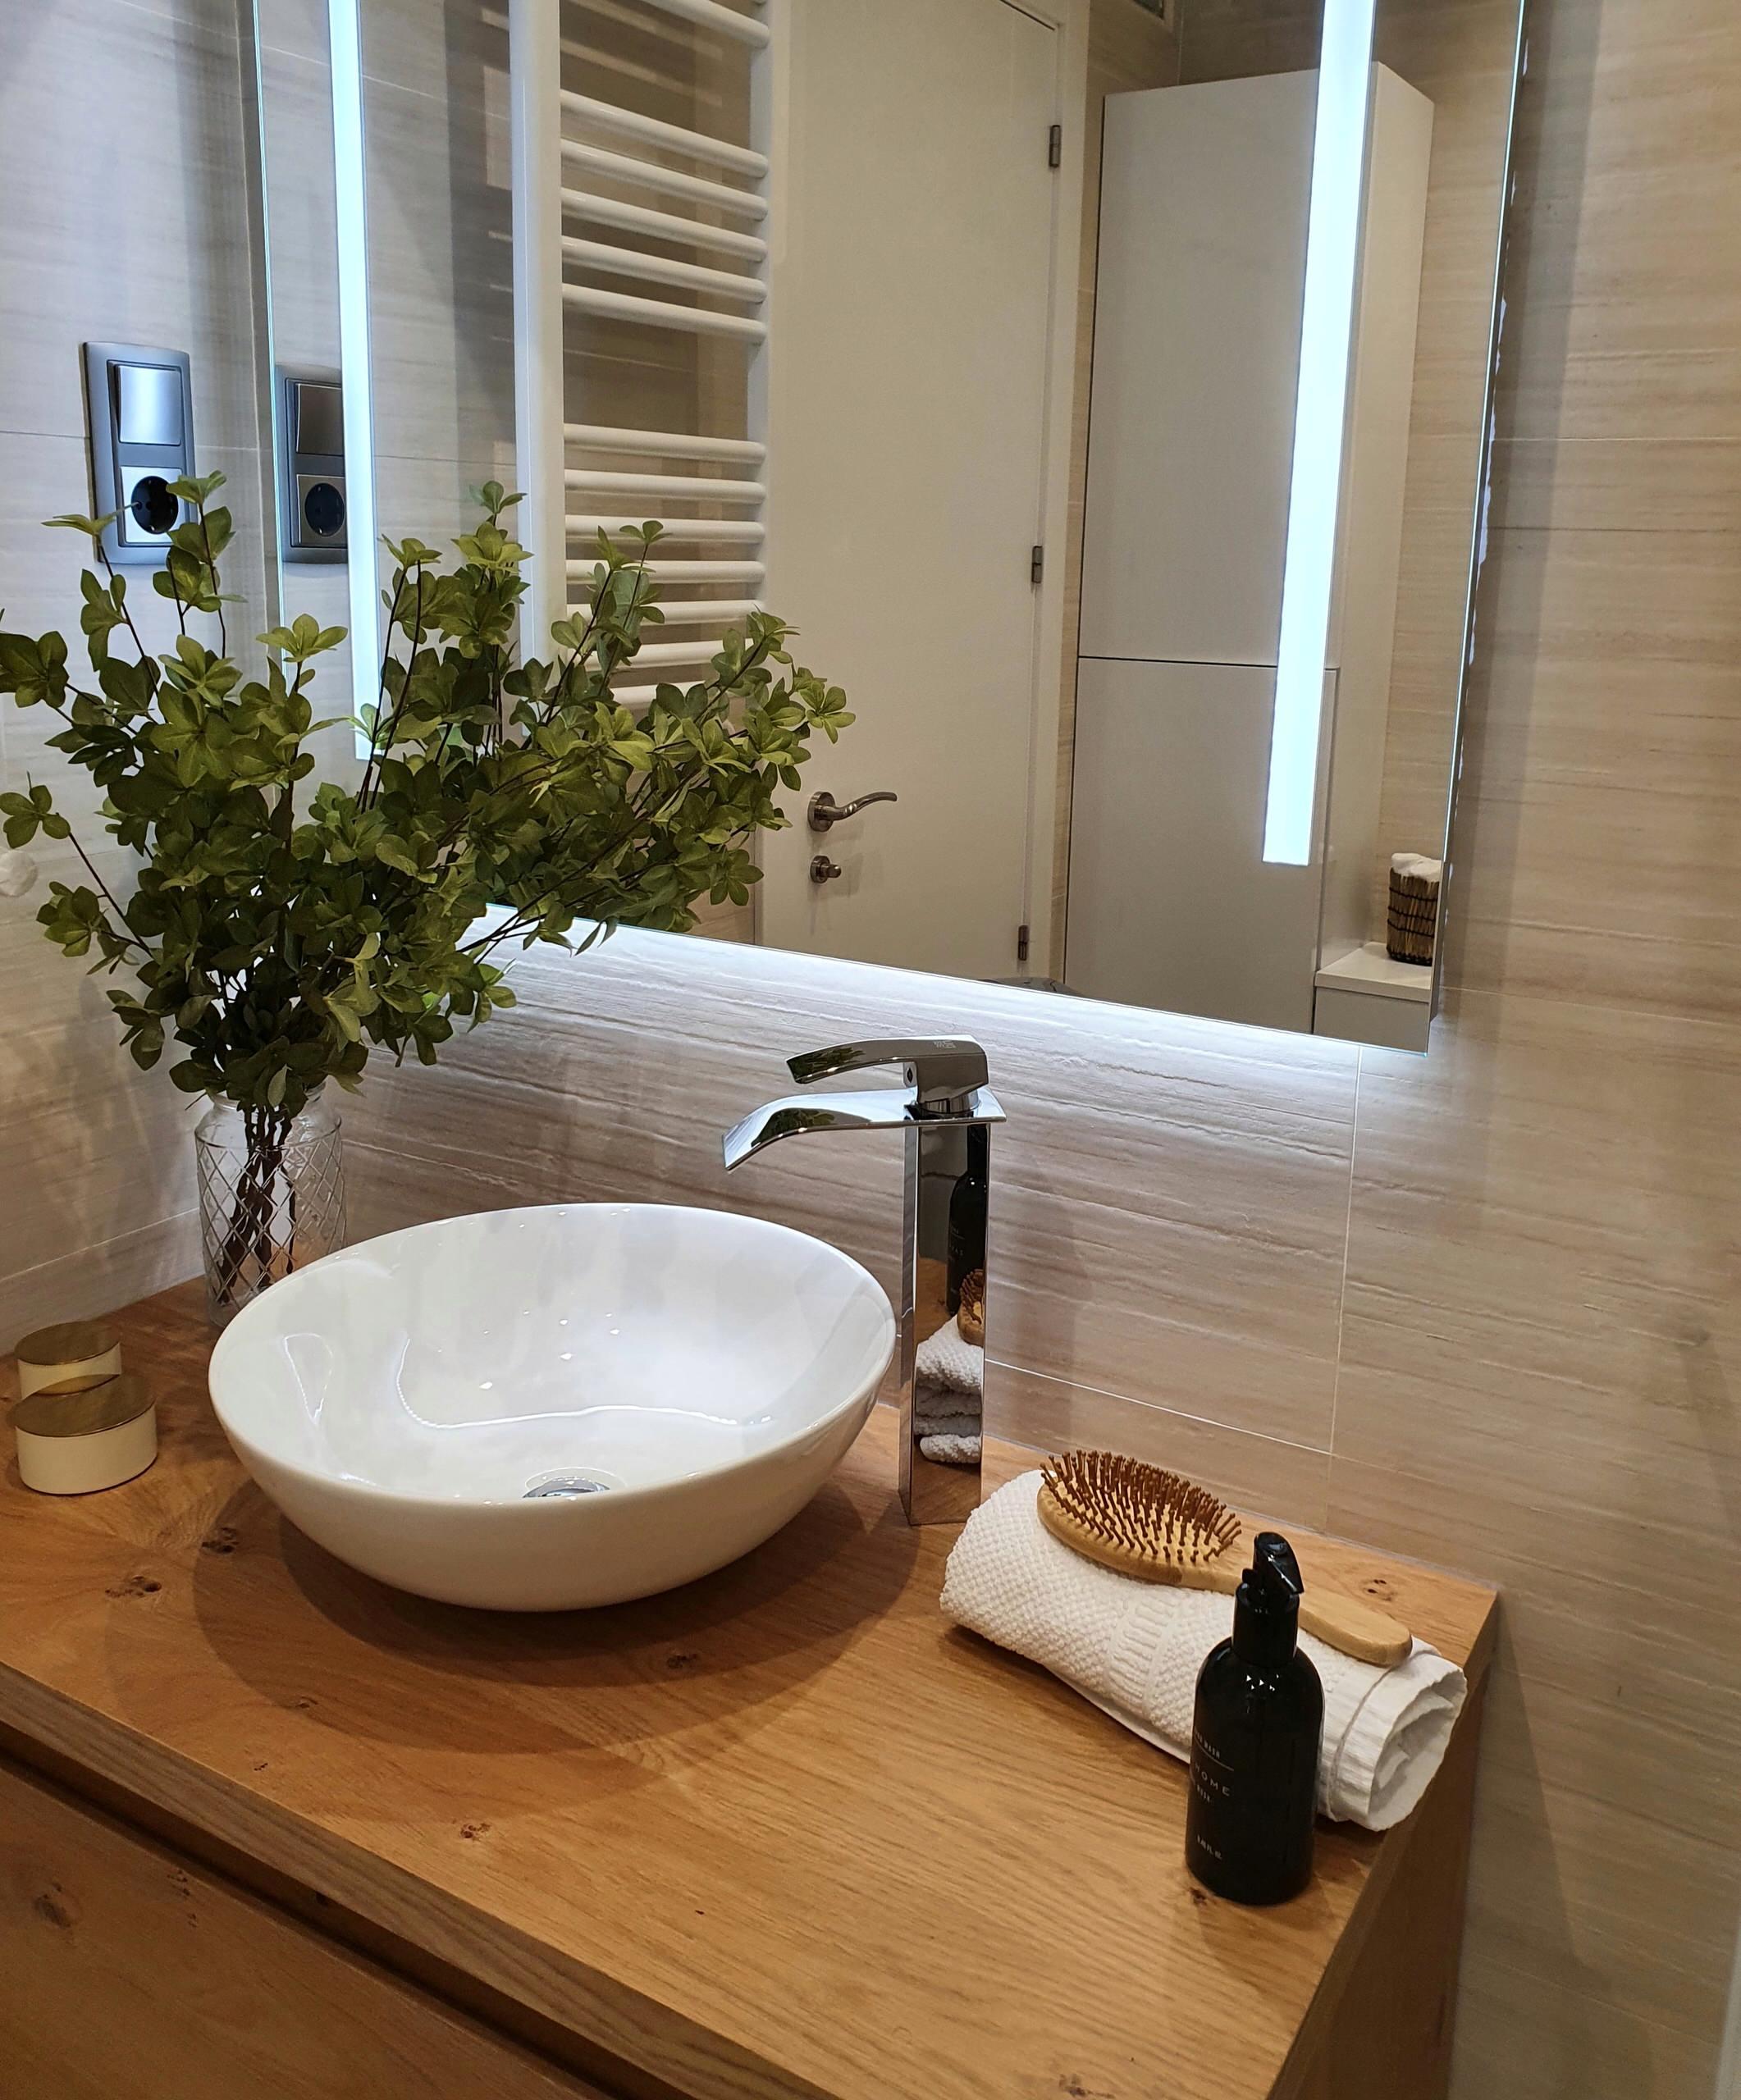 Baño reformado, zona de lavabo